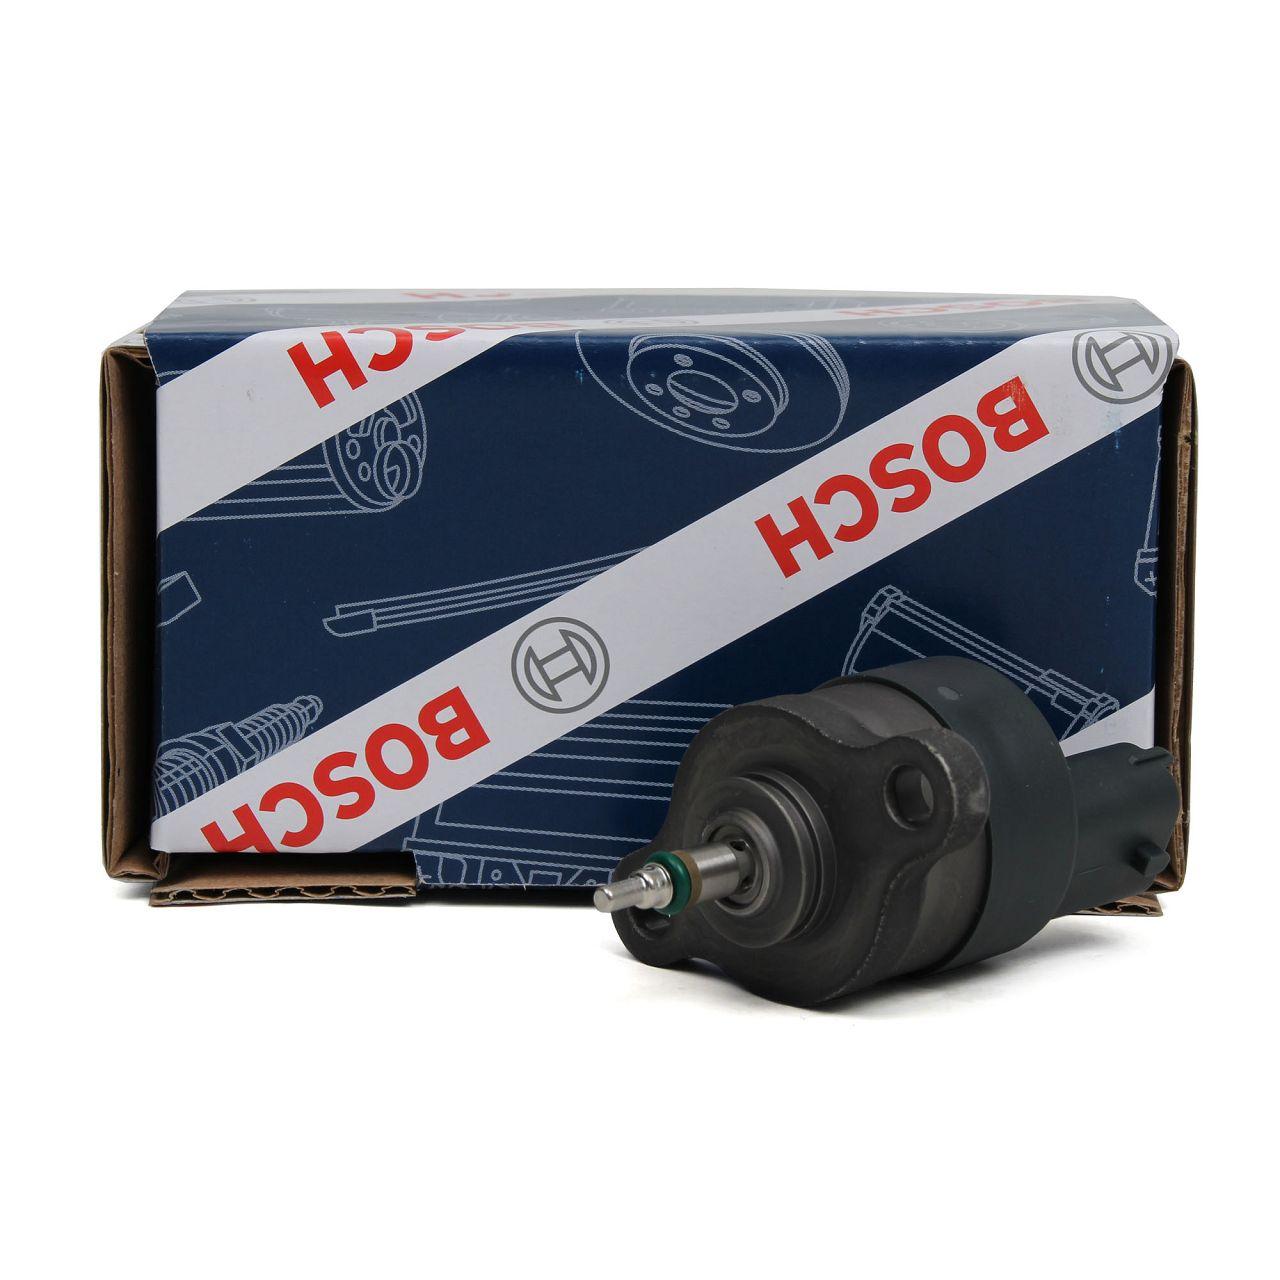 BOSCH 0281002480 Druckregelventil Common-Rail-System für BMW E46 E39 E38 X5 E53